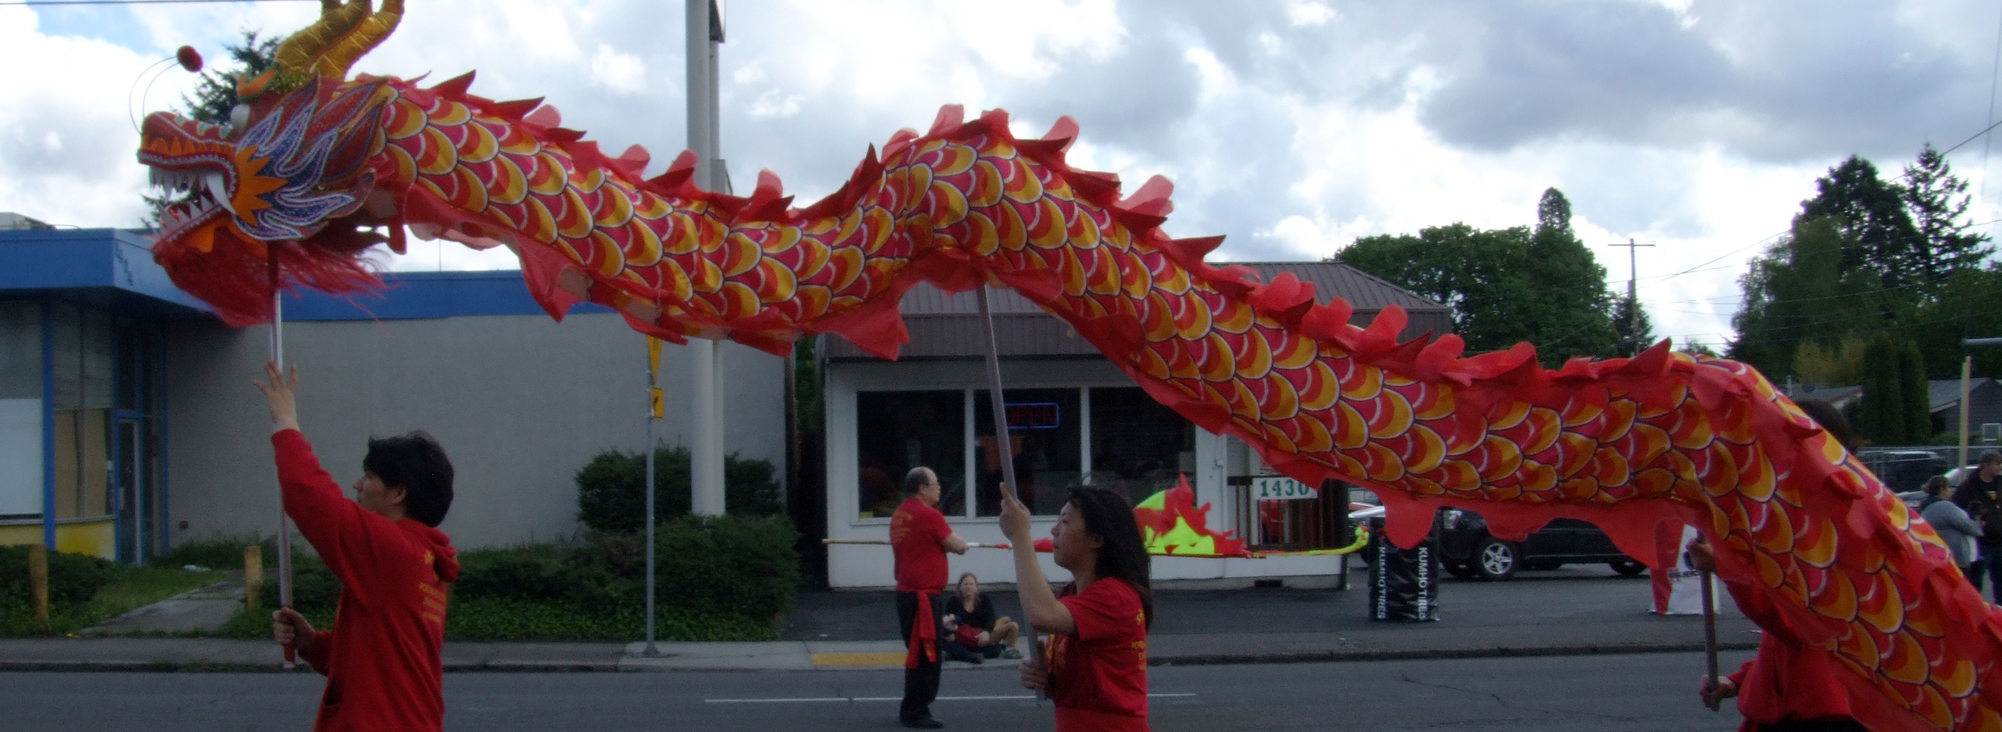 Dragon float at 82nd Avenue parade